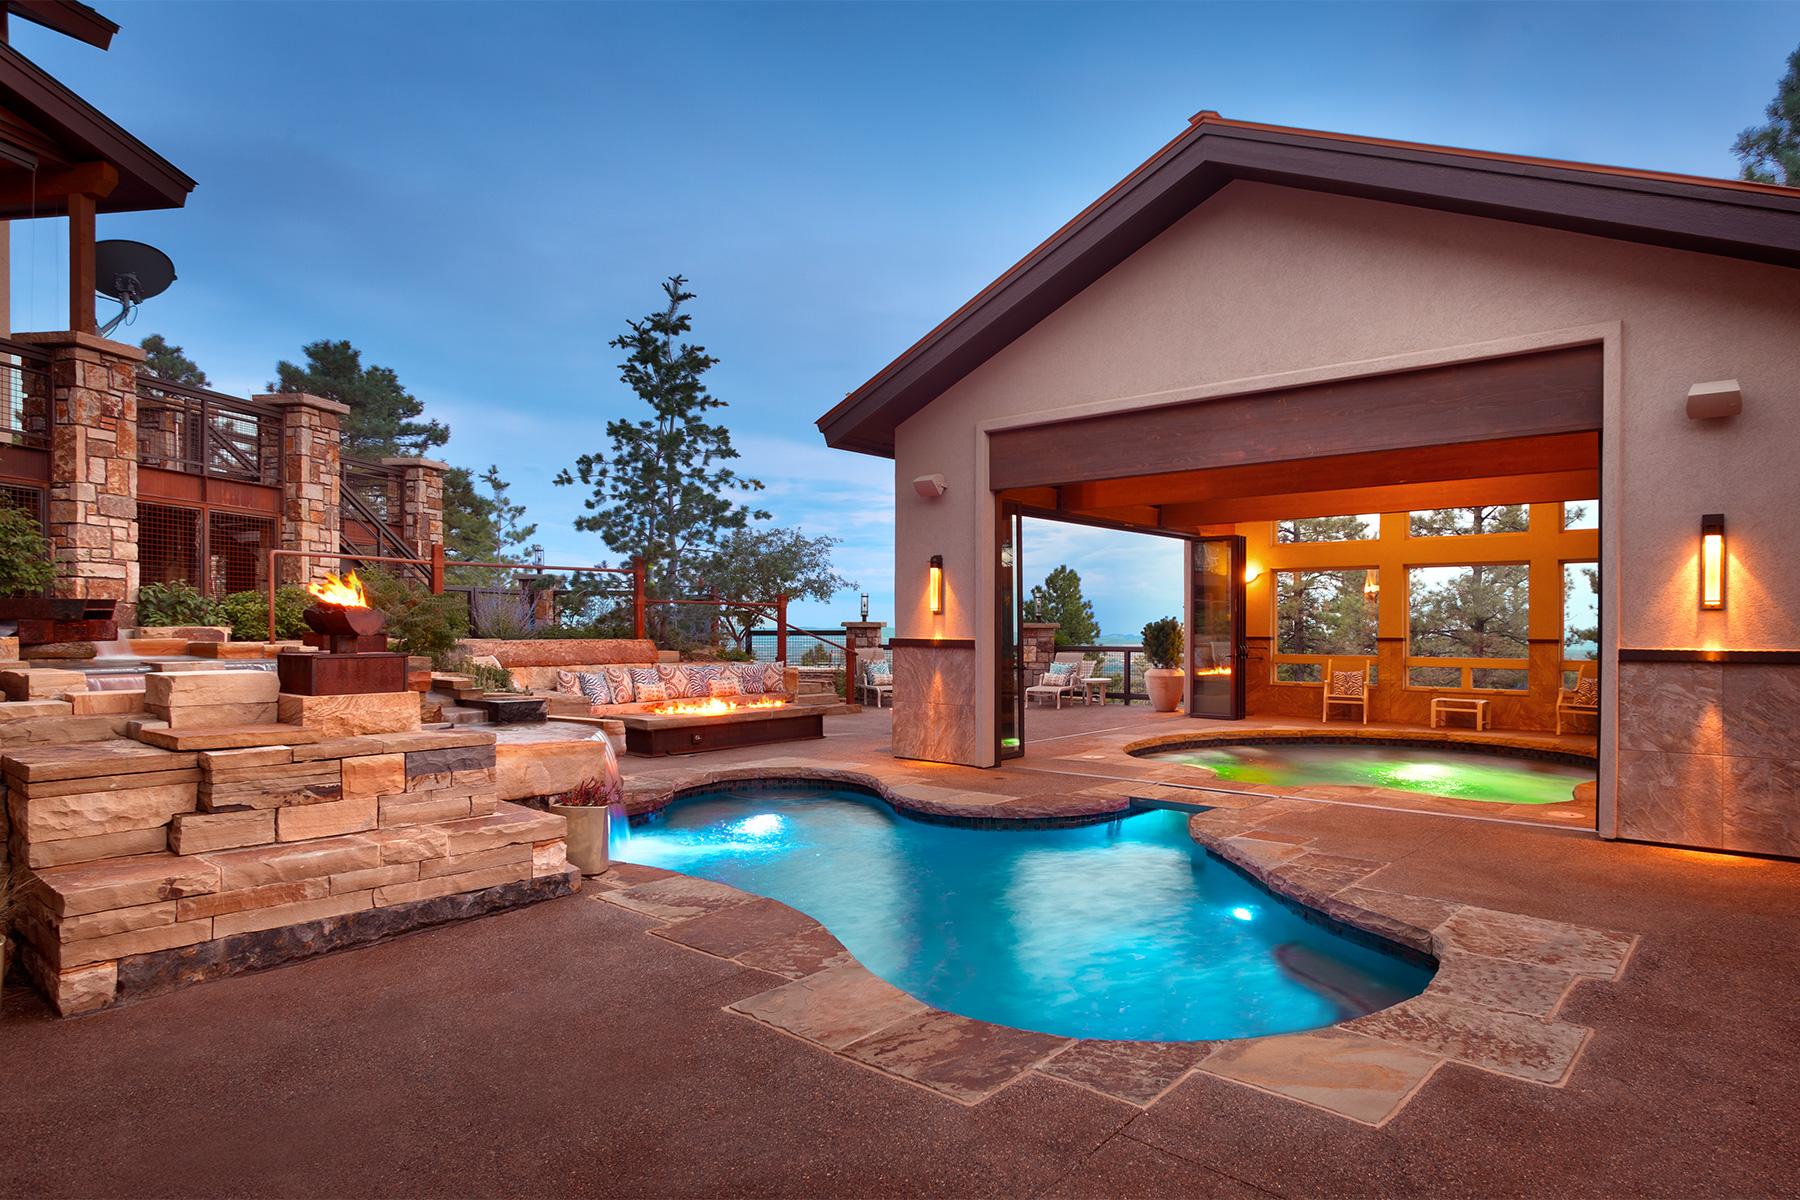 Casa Unifamiliar por un Venta en 711 Damascus 711 Damascus Road Durango, Colorado 81301 Estados Unidos